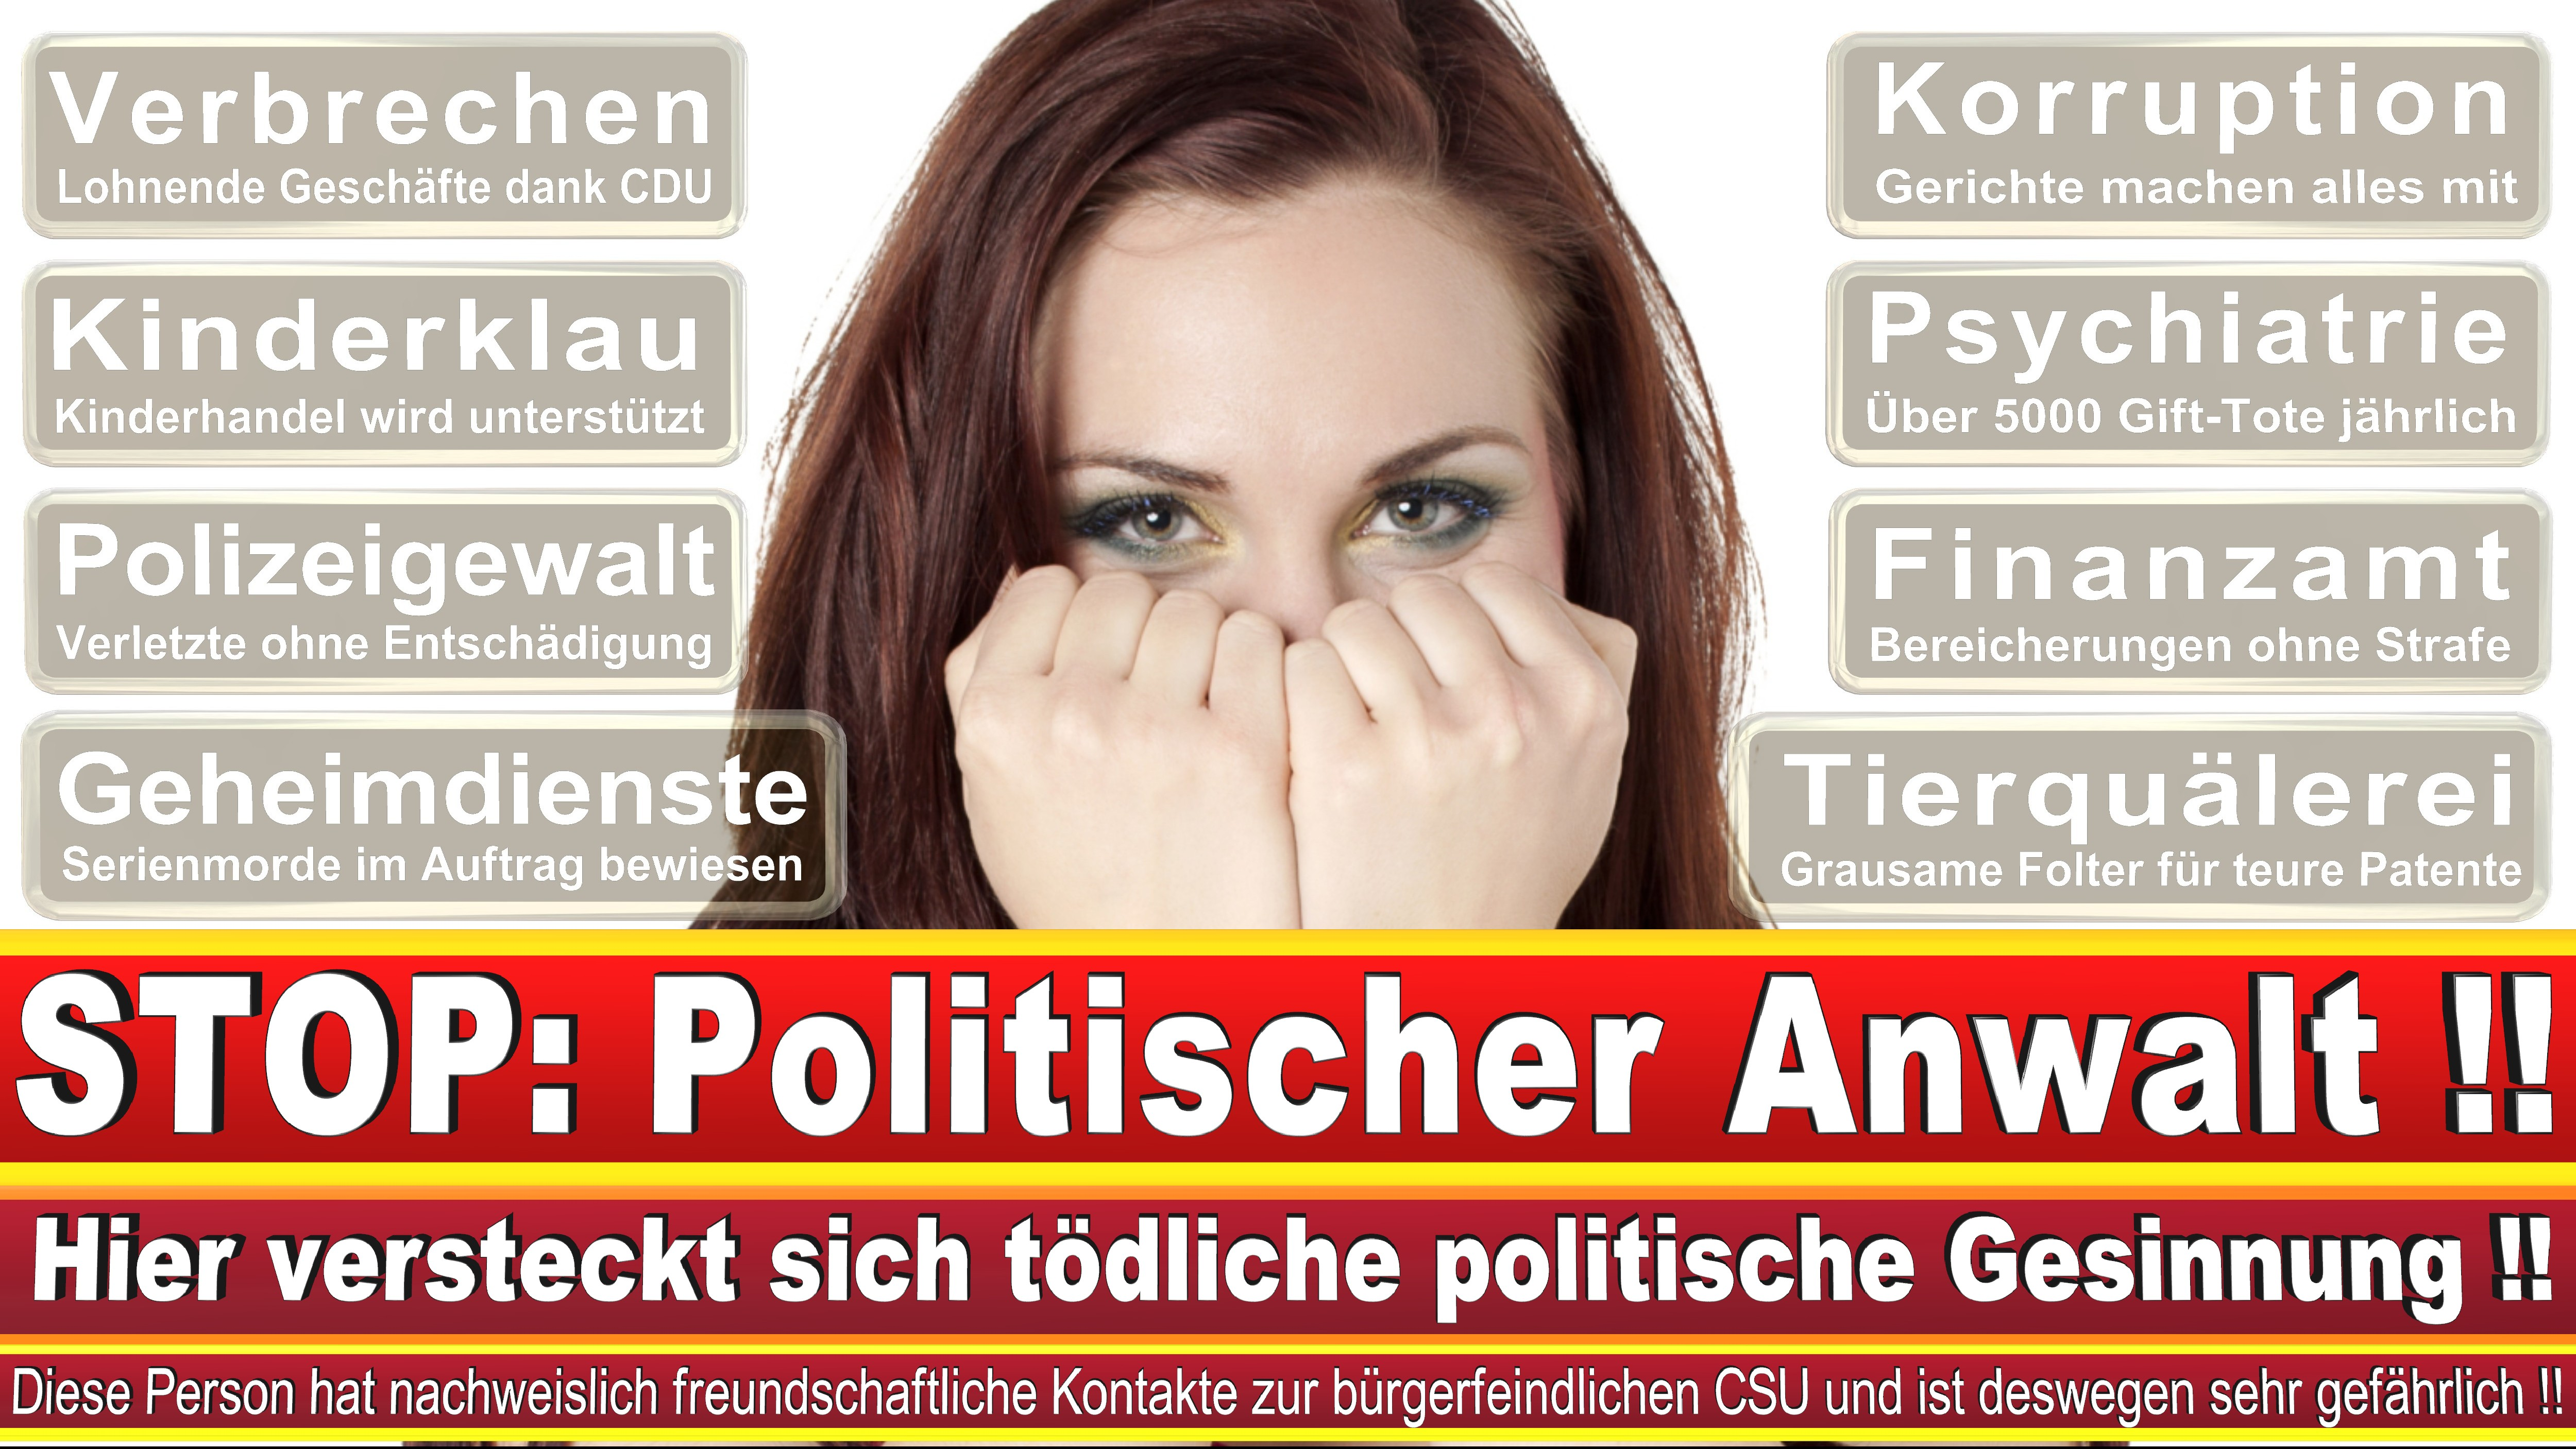 Rechtsanwältin Julia Lüttge Berlin Selbstständig Rechtsanwältin Und Mediatorin LÜTTGE Rechtsanwälte 1